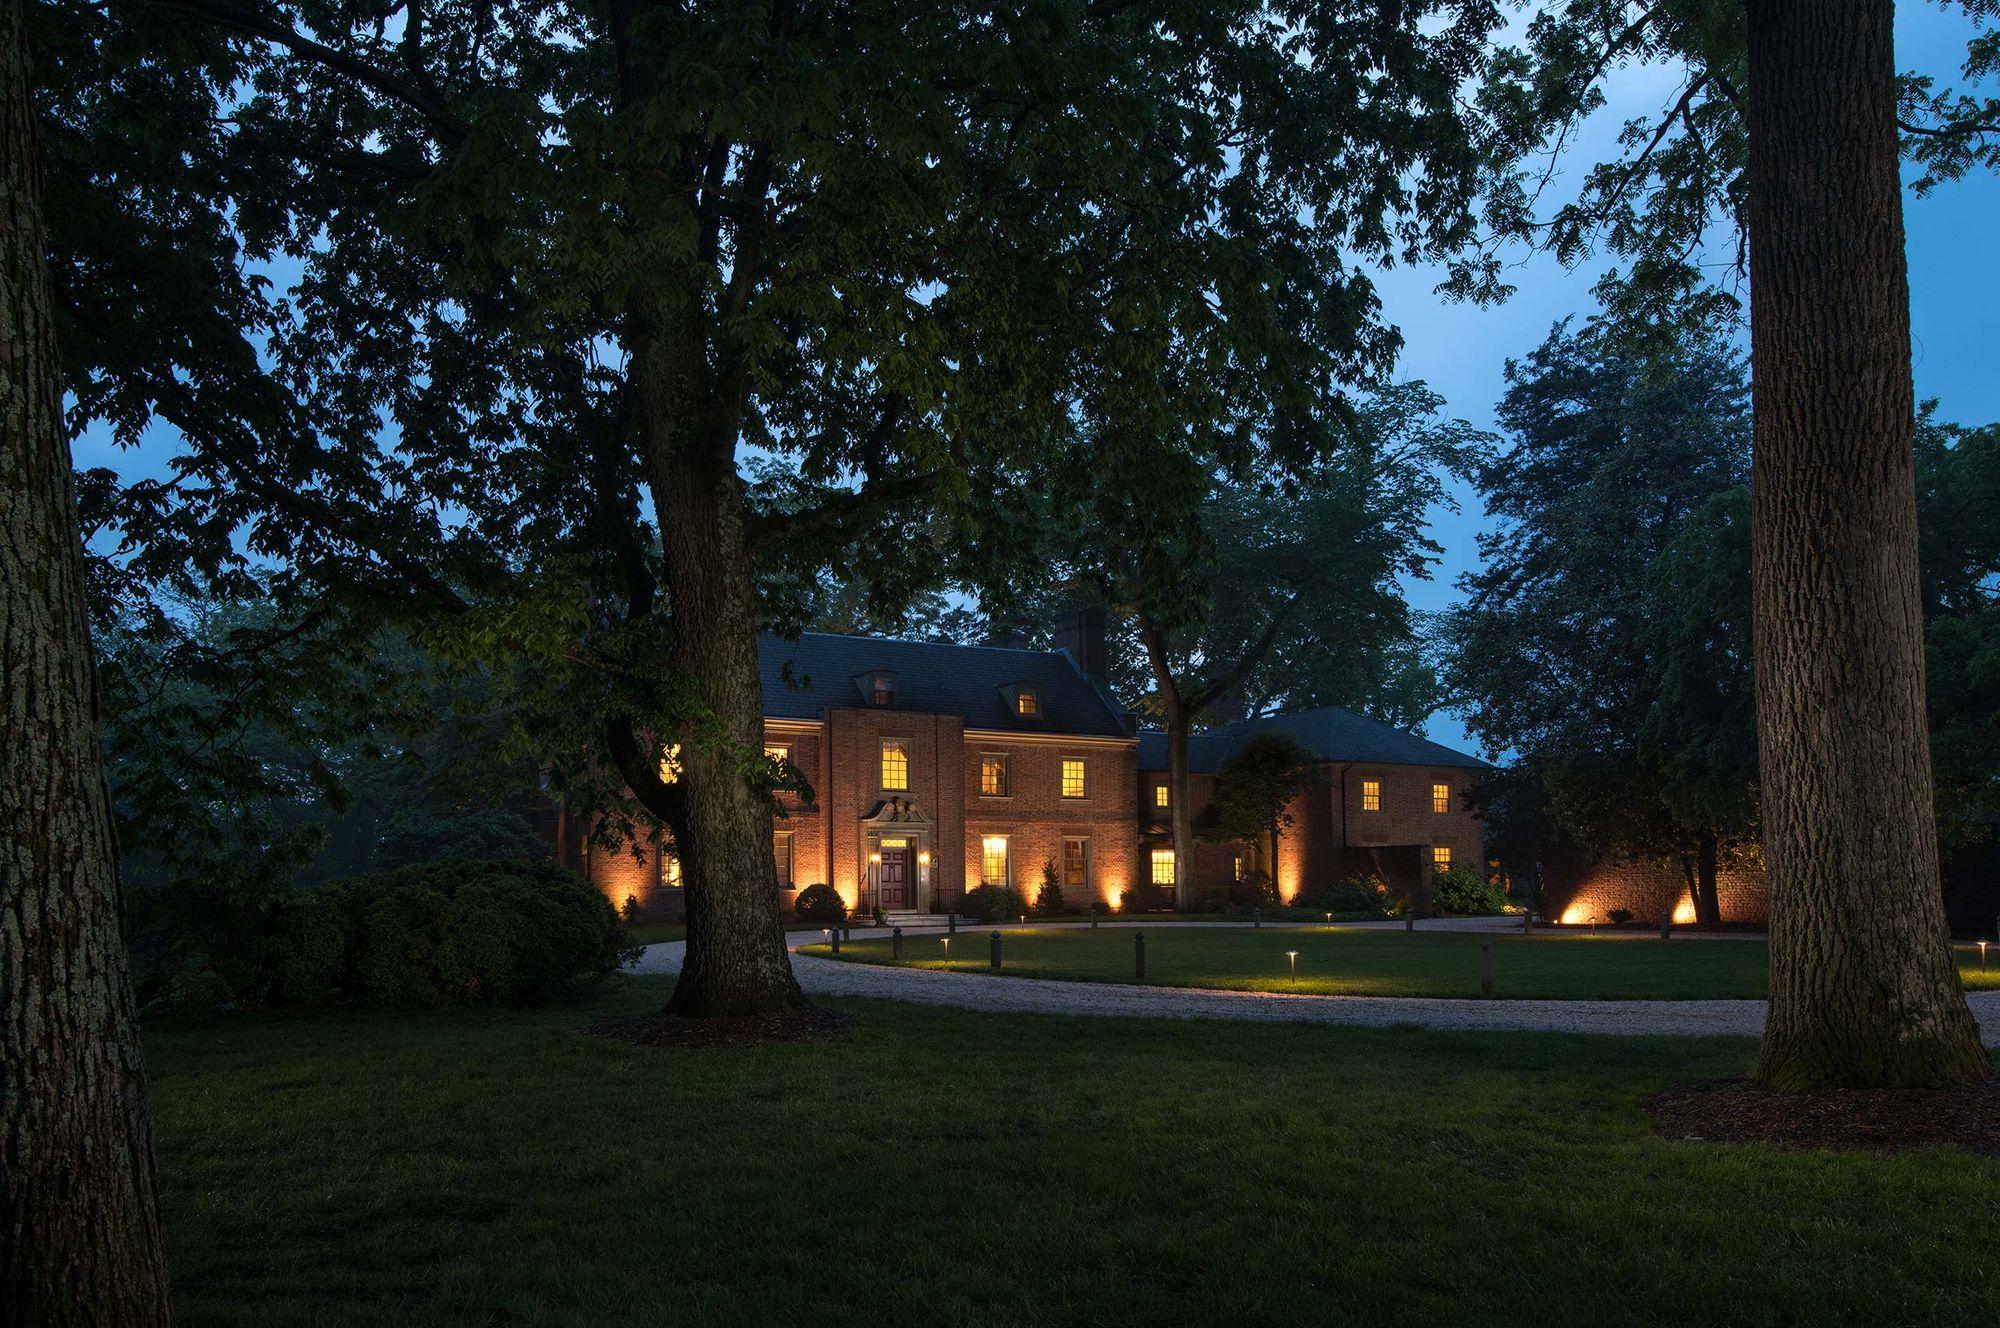 Great-Oak-Manor---Exterior---Front---Dusk---May-2018-(14).jpg